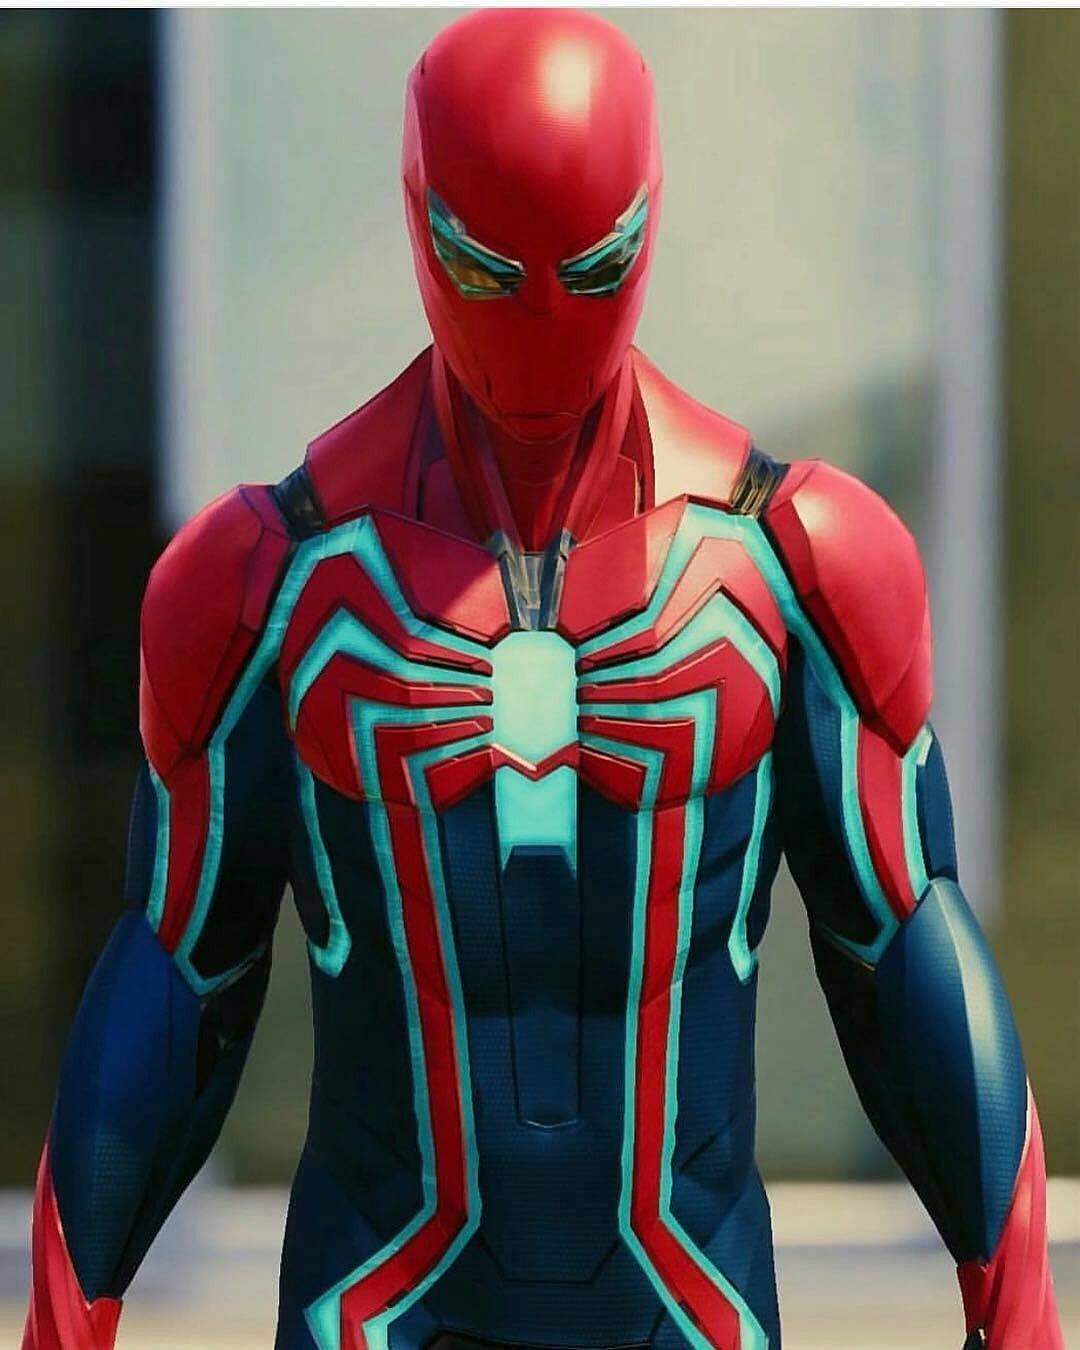 Pin By Bennett On Marvel Spiderman Marvel Spiderman Spiderman Costume